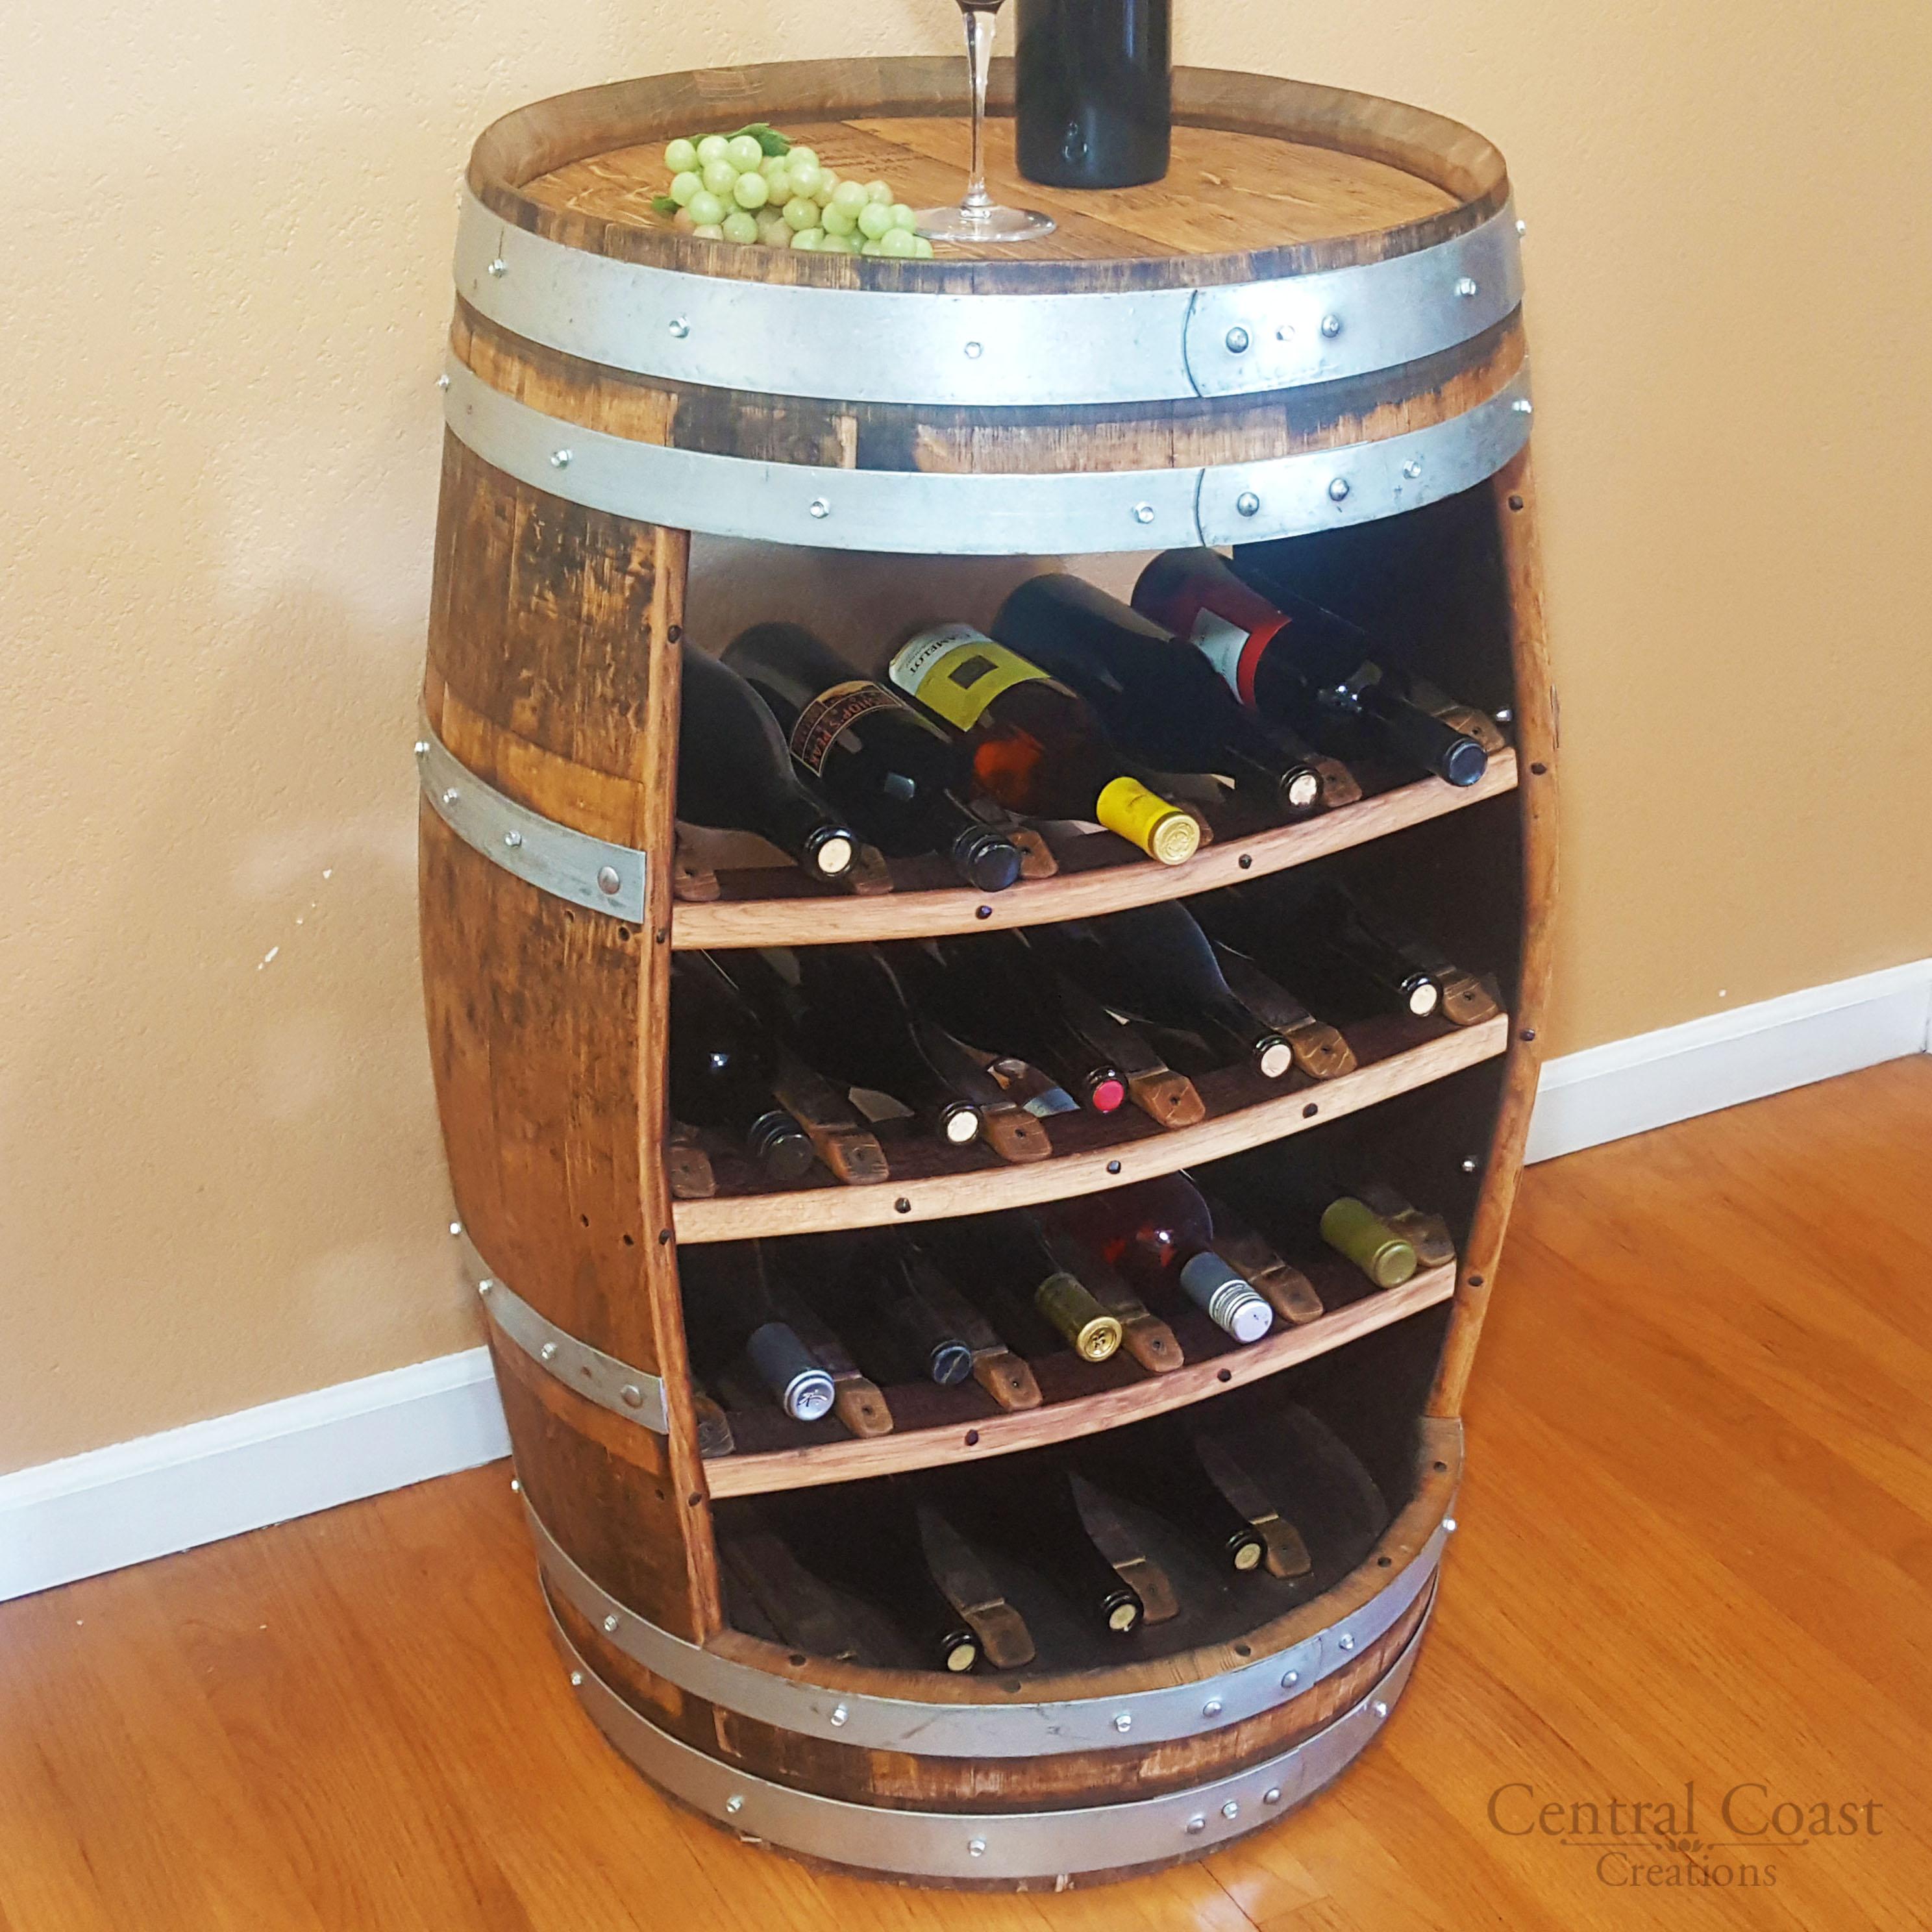 wine barrel 18 bottle wine rack free shipping central